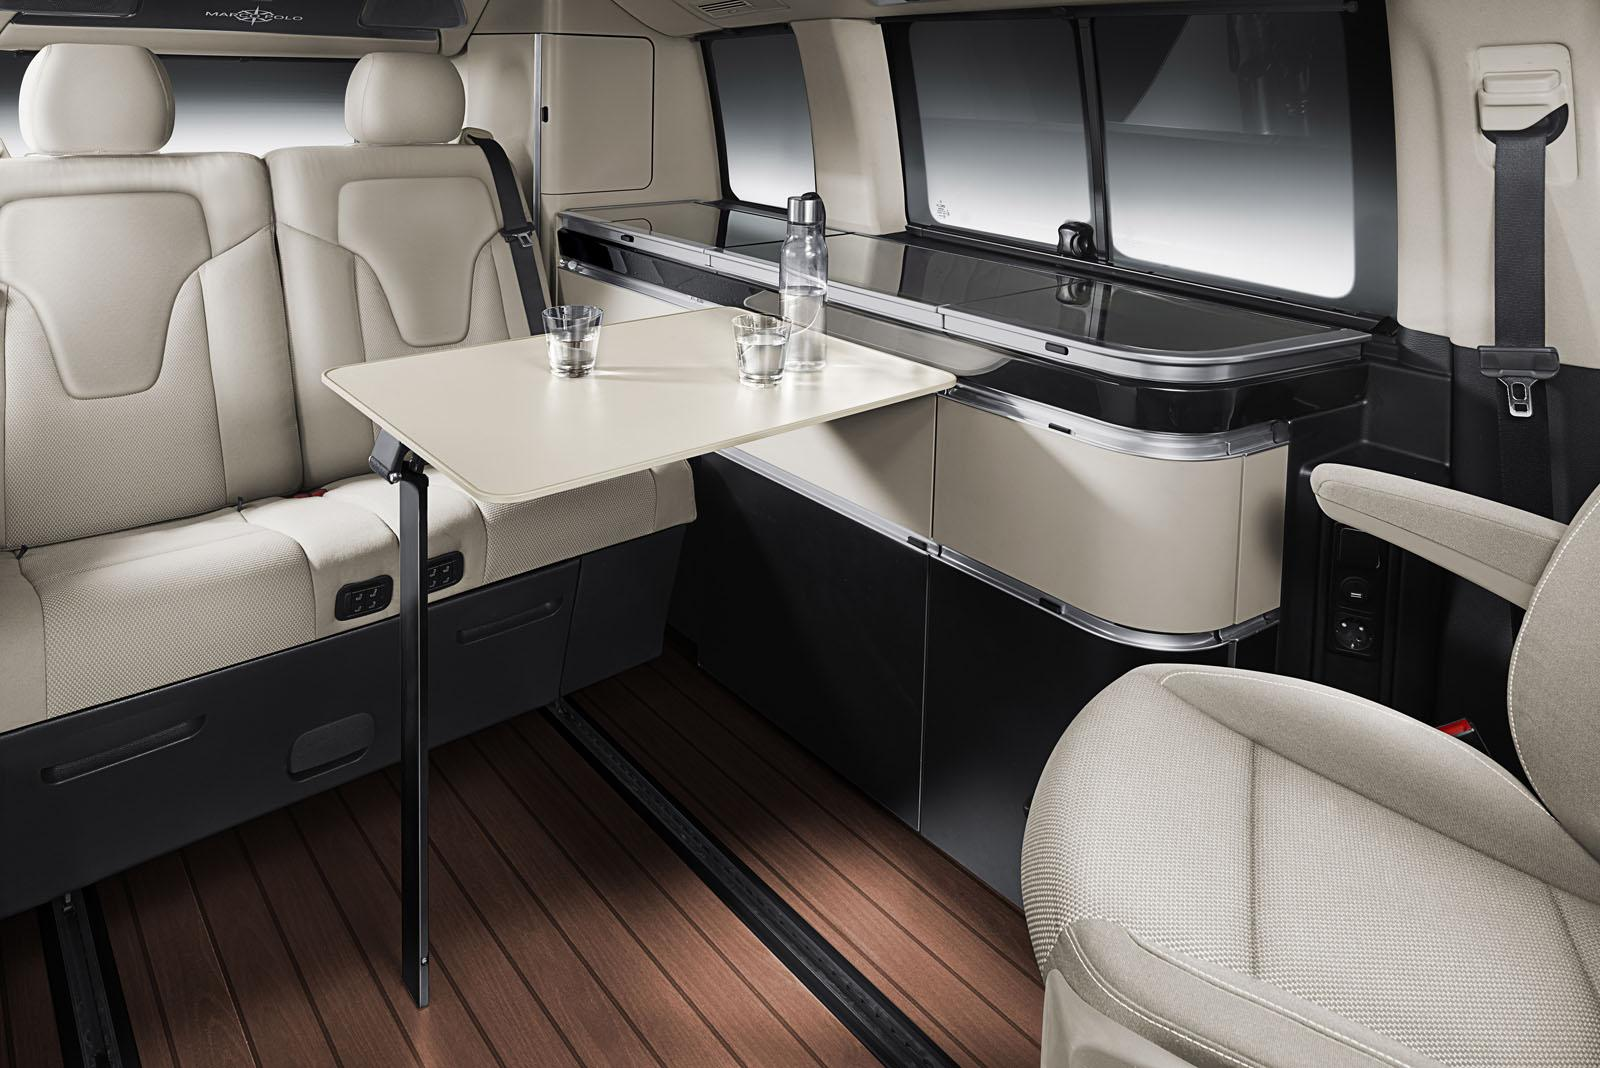 mercedes classe v marco polo 3 4. Black Bedroom Furniture Sets. Home Design Ideas